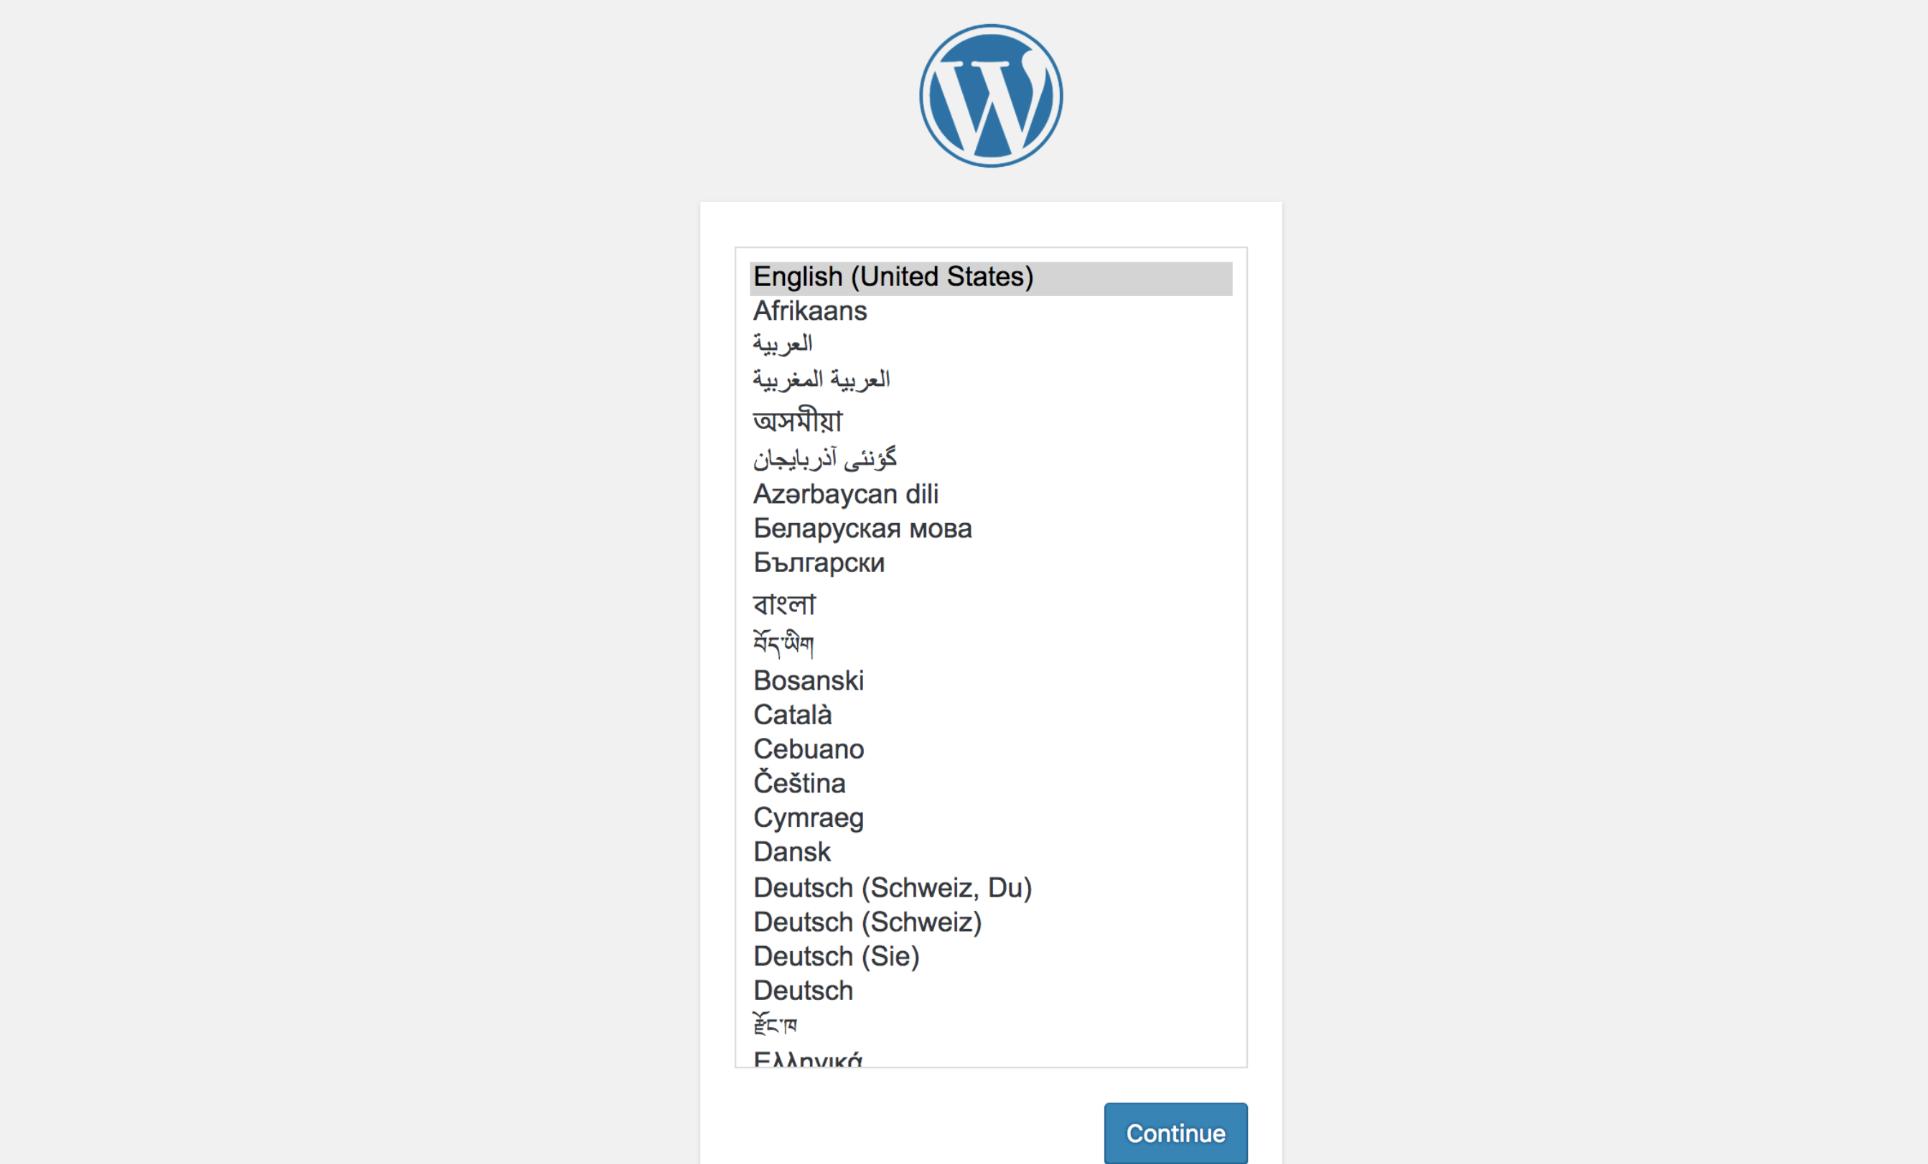 Access the WordPress service